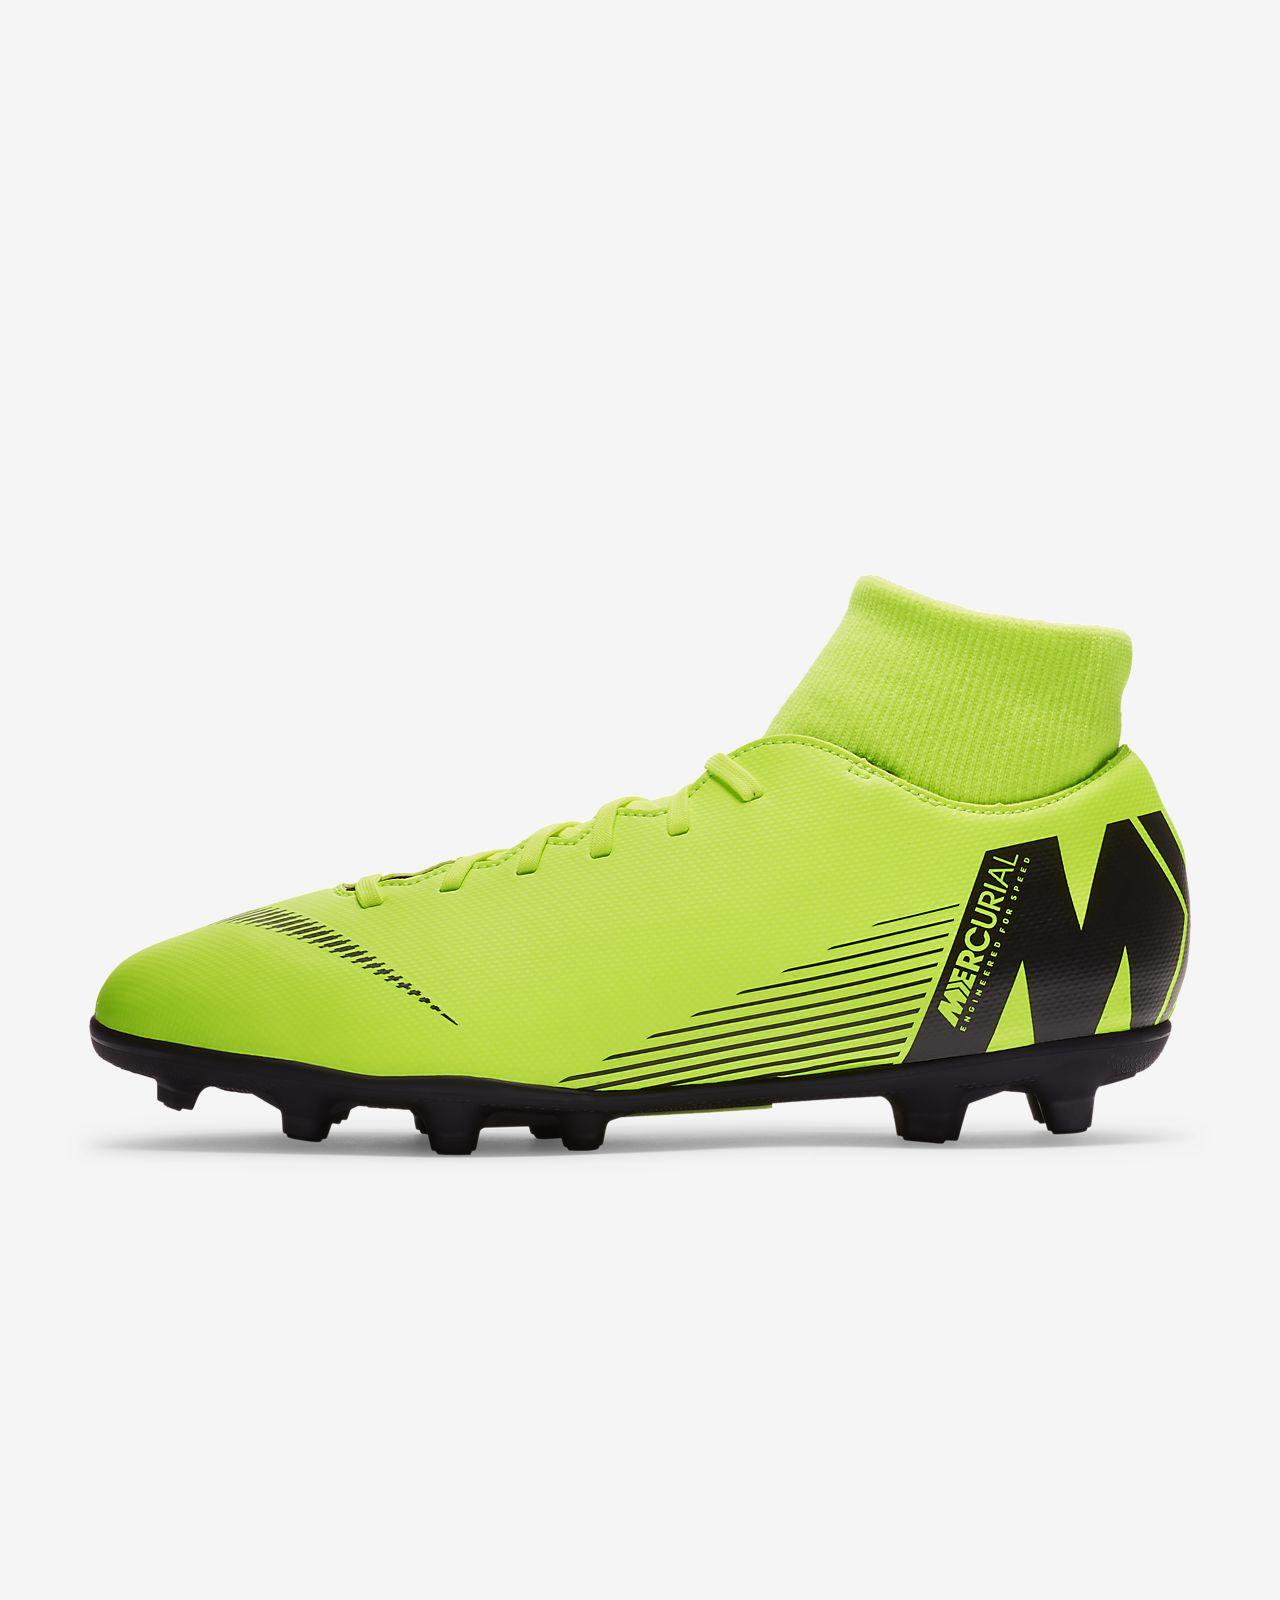 Para Superficies Mercurial Calzado Fútbol Superfly Múltiples Nike De wqSEzxHEI